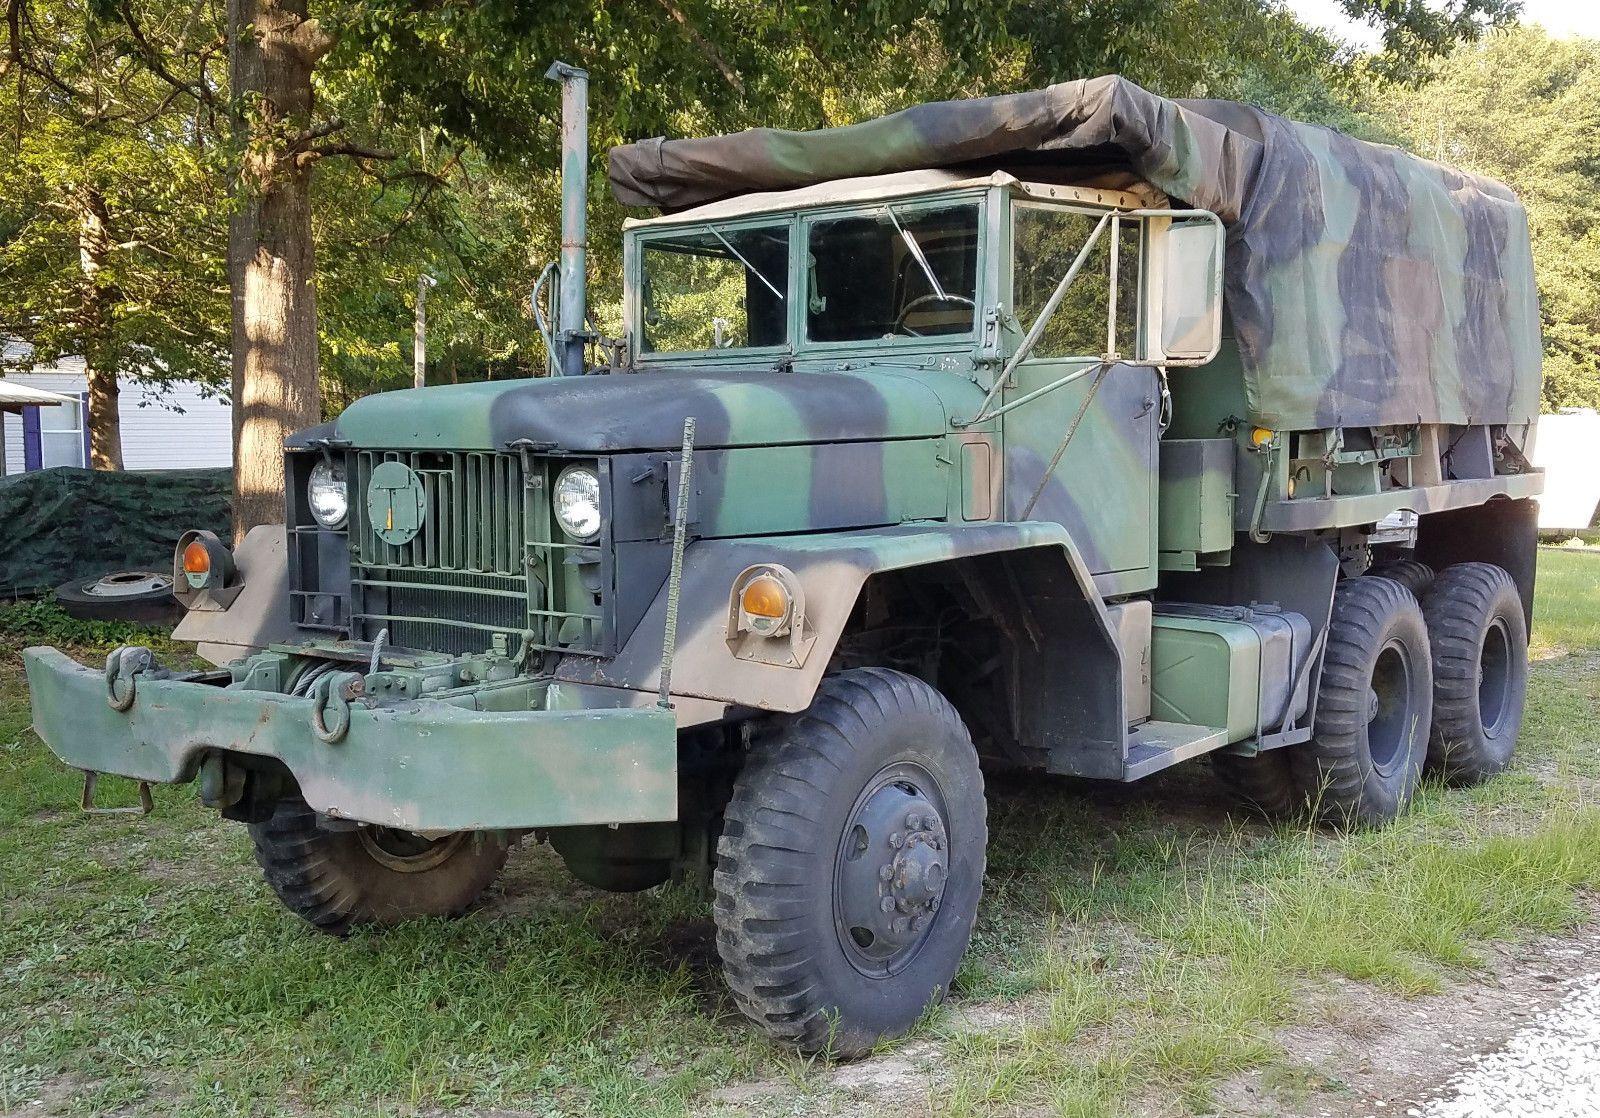 Troop Carrier Package 1968 Jeep Kaiser Military Dump Truck ...